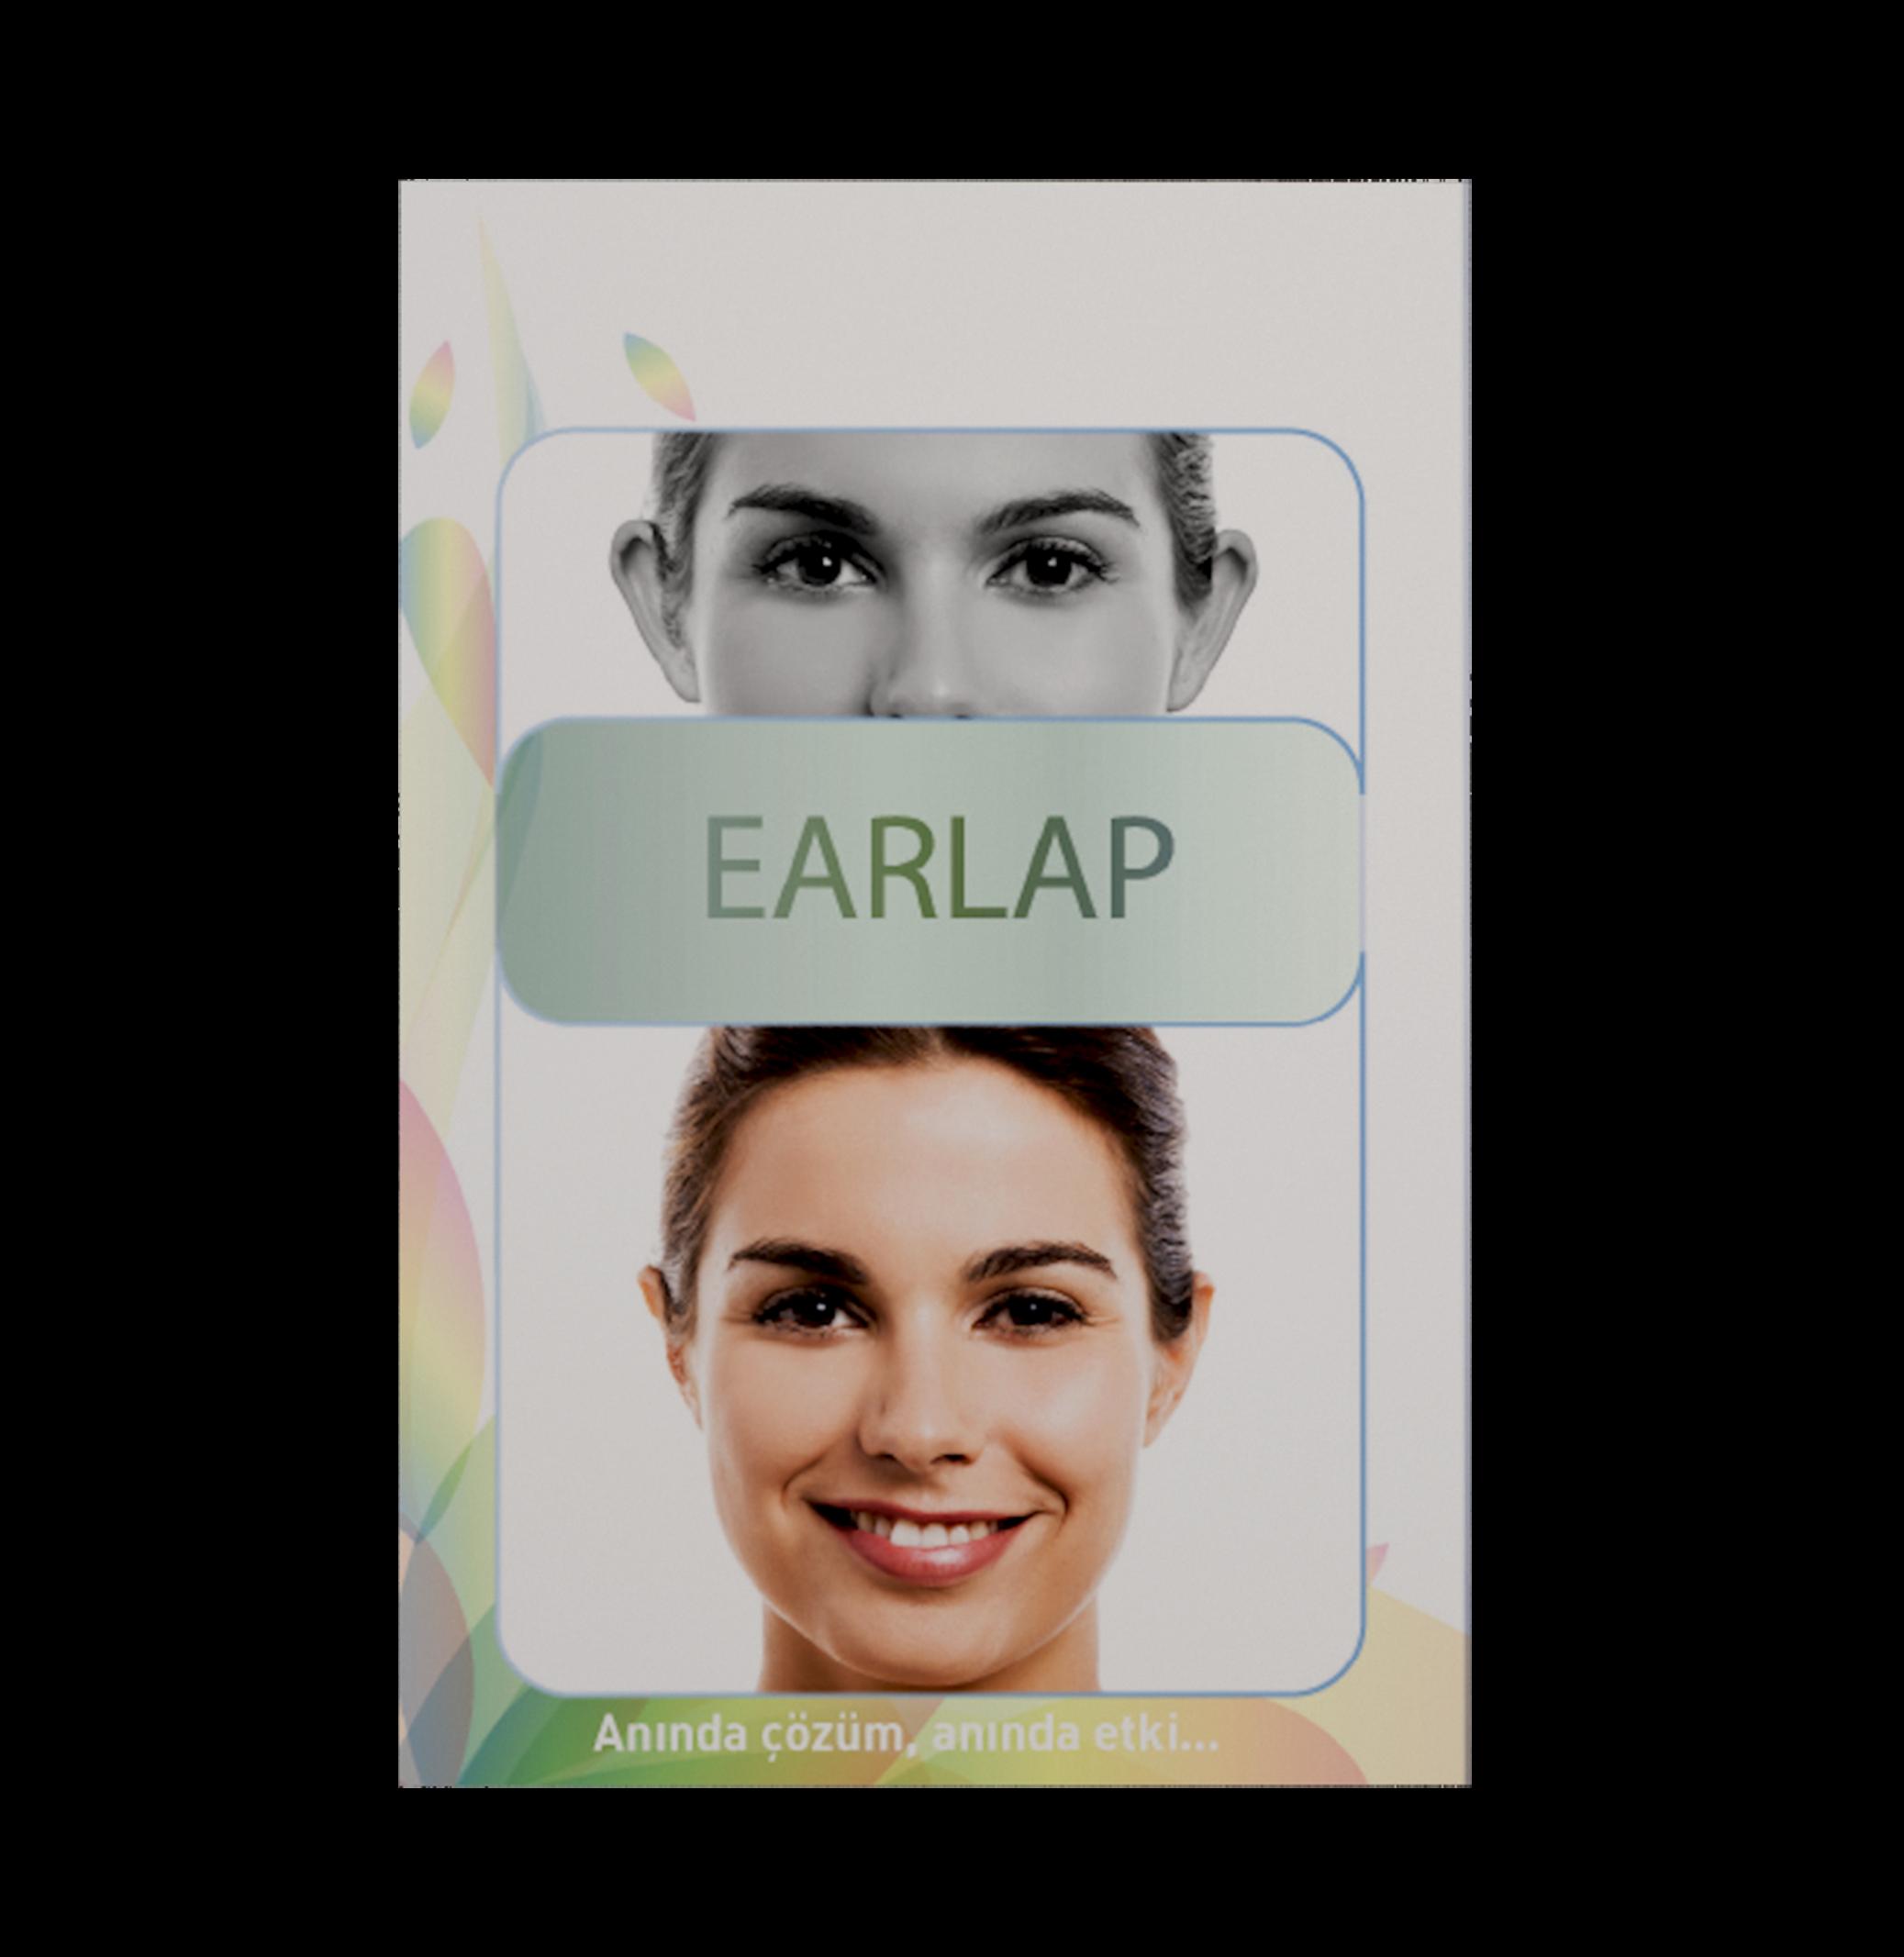 Beauty Tapes EARLAP Ear Cauliflower Protruding Corrector Flatter Otostick Arilis Magic Touch 7 Days Durable